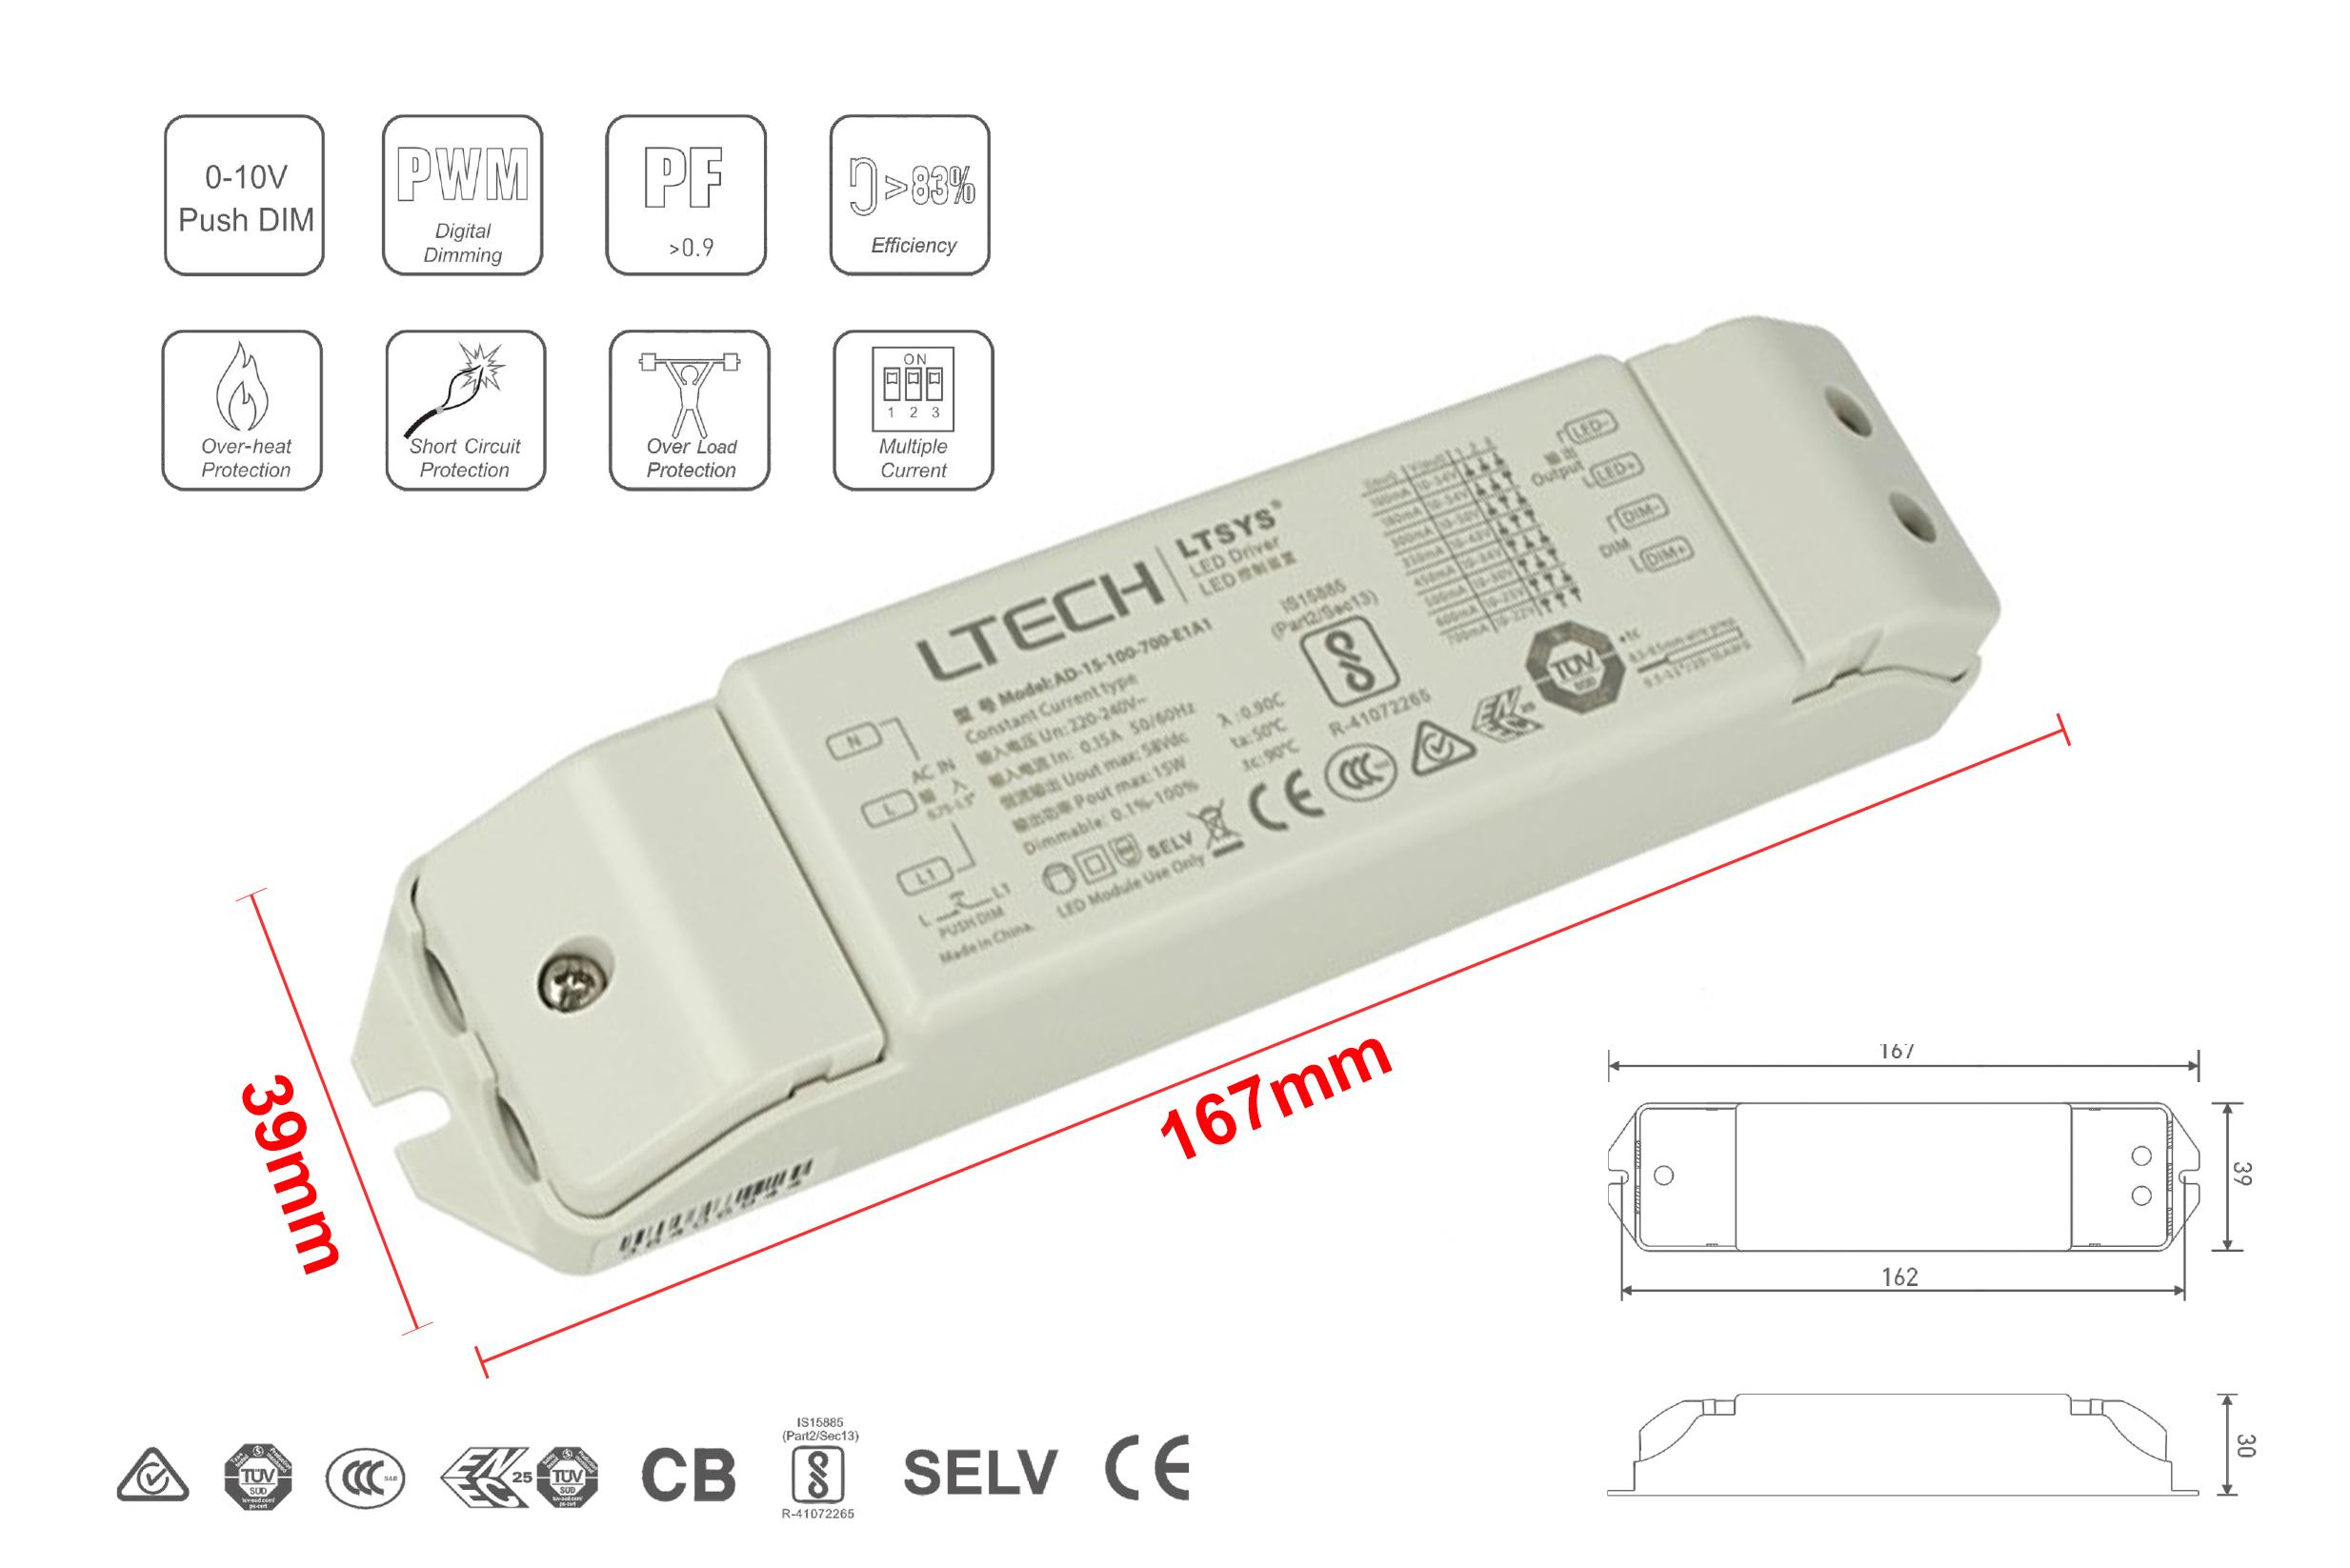 Led Driver CC Dimmerabile 0/1-10V Pulsante N.O. Push Dimmer 15W Regolabile 100/180/300/350/450/500/600/700mA - PZ